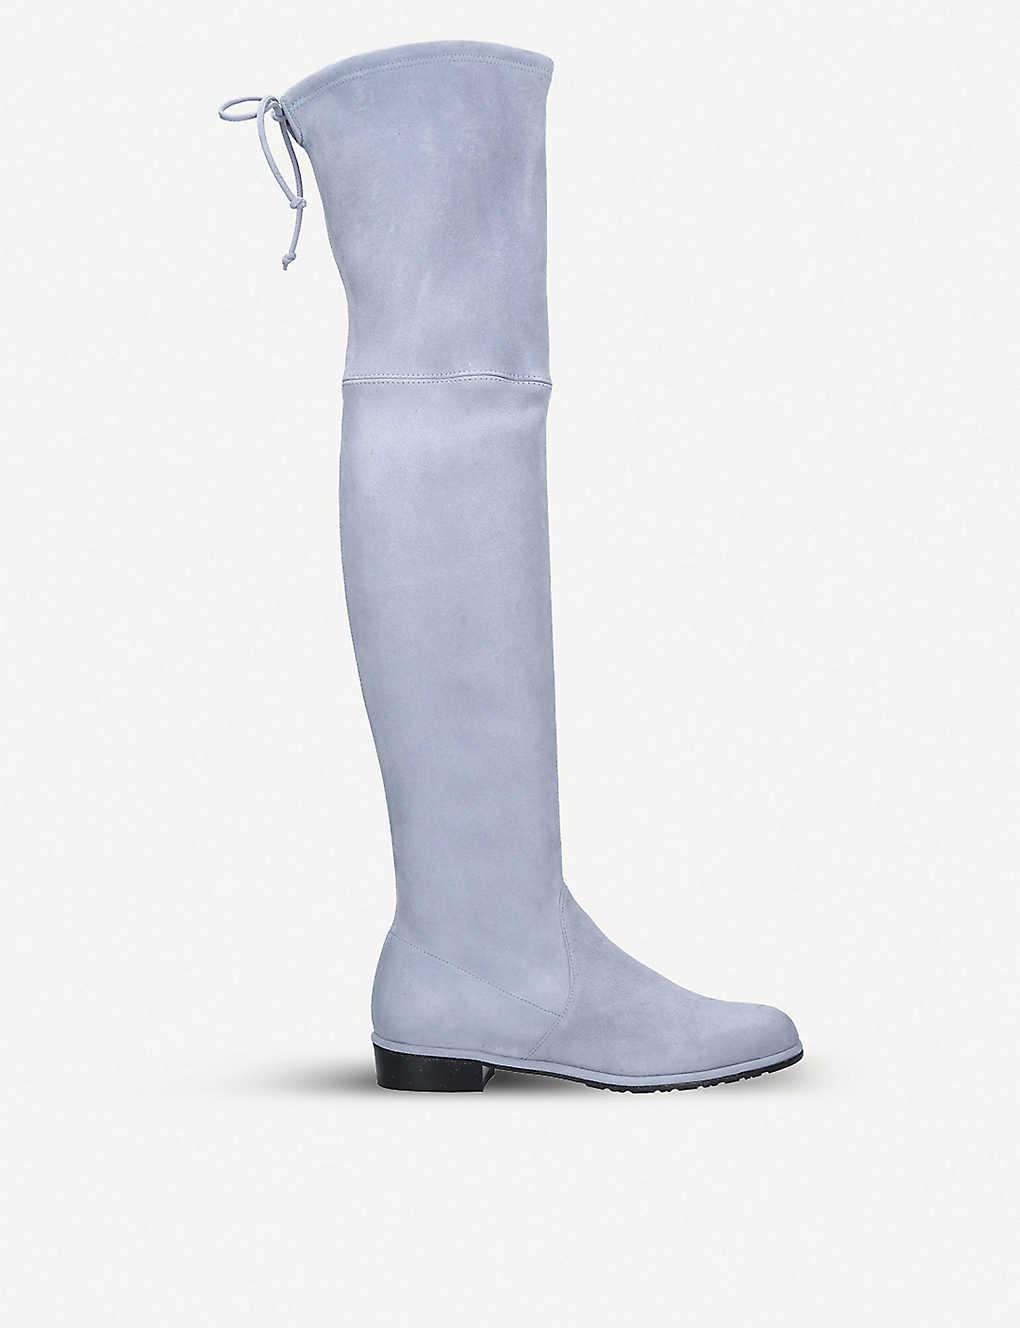 dbddcbe88db STUART WEITZMAN - Lowland suede over-the-knee boots